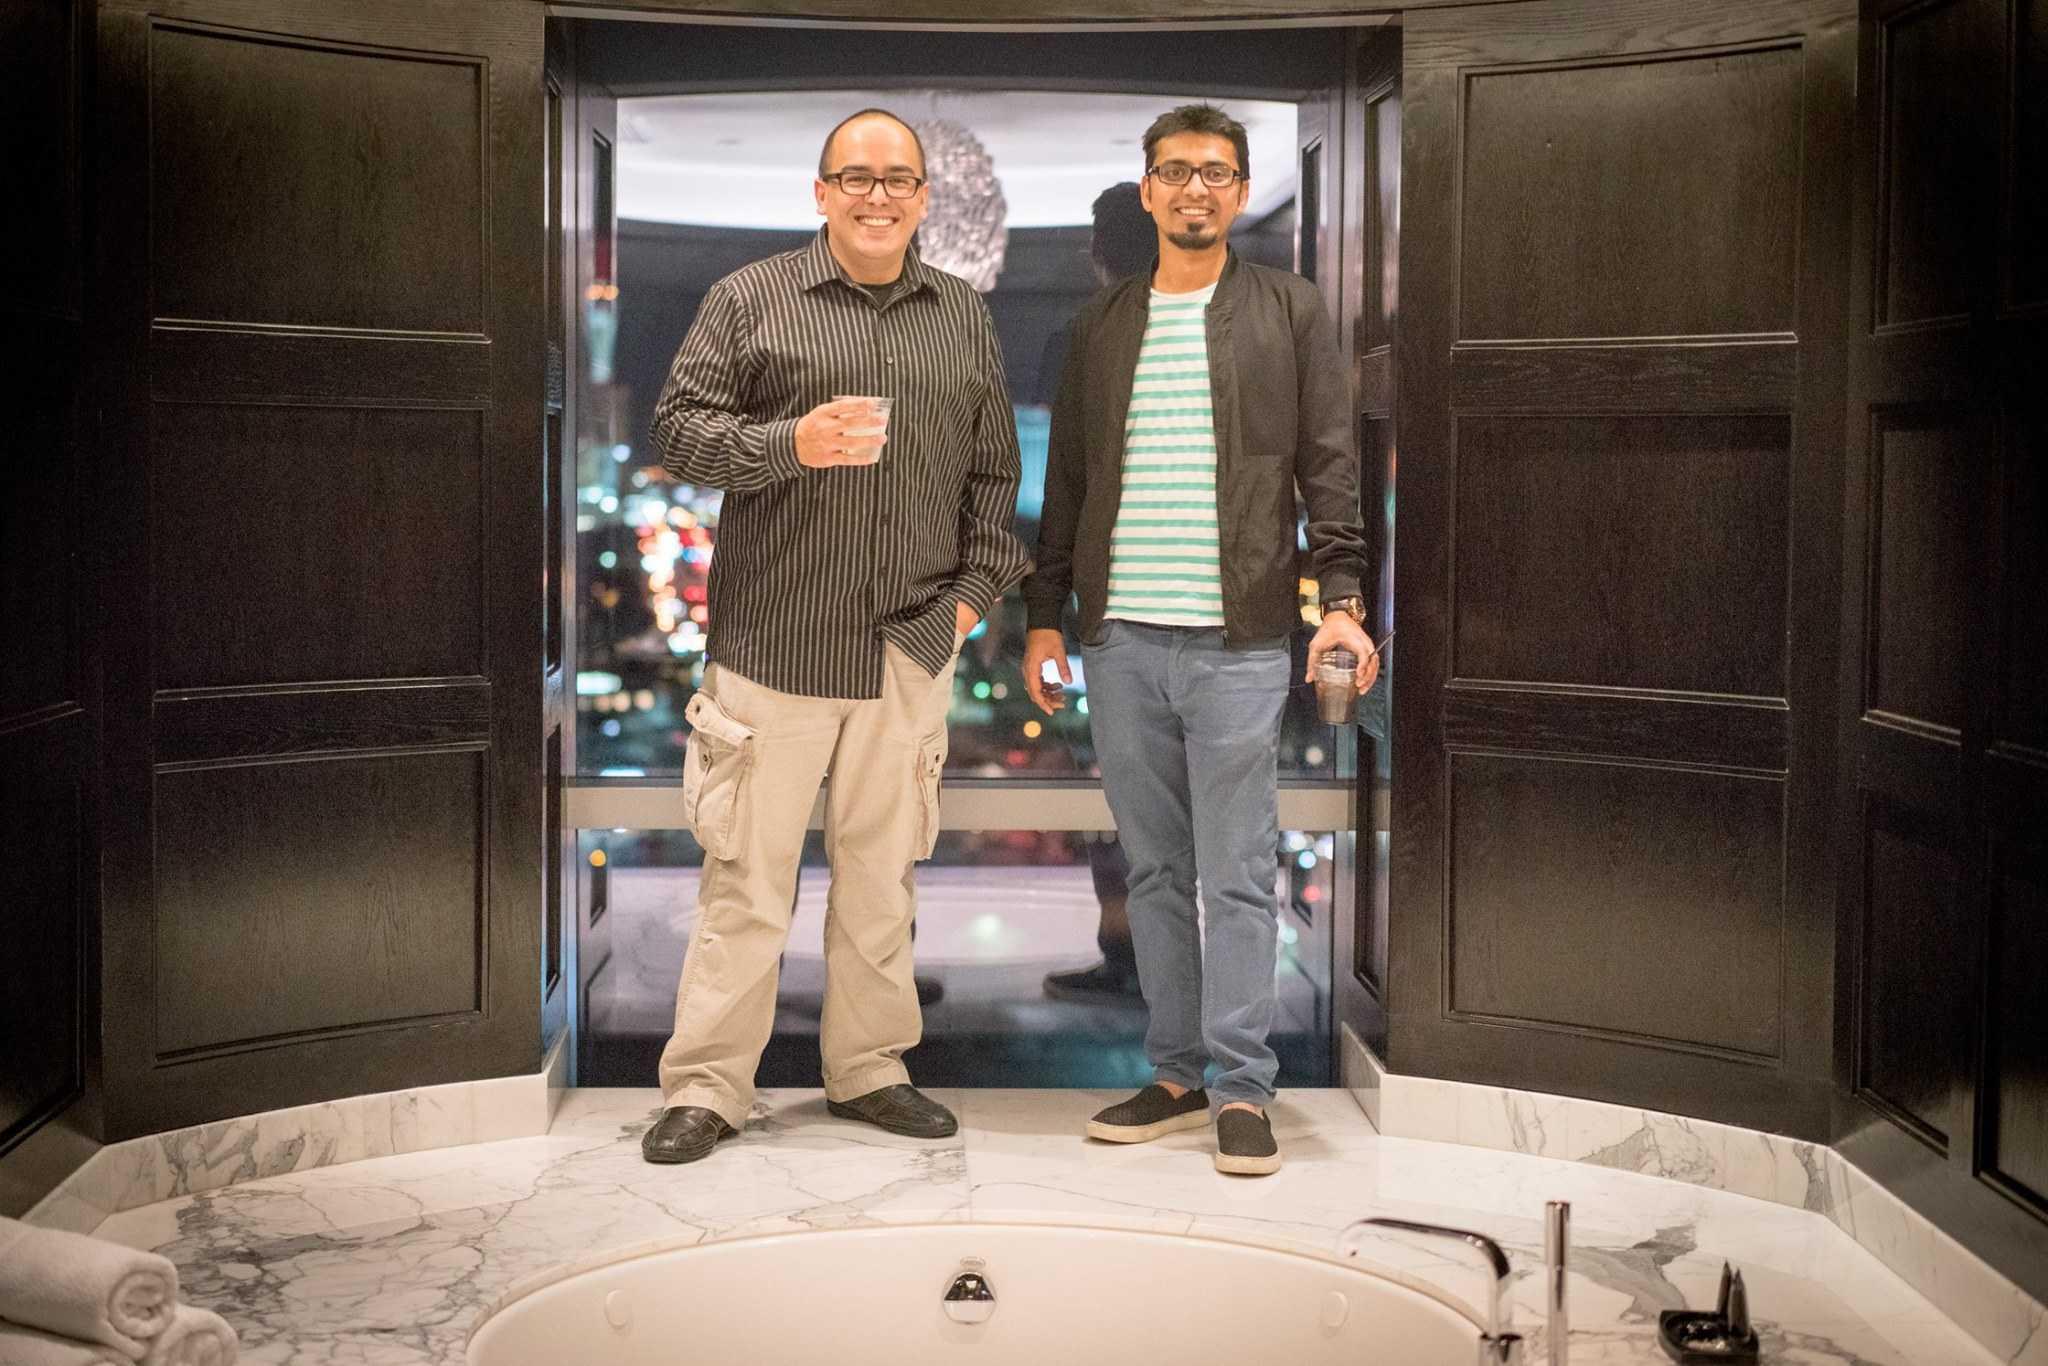 Harsh Agrawal and Oscar tech